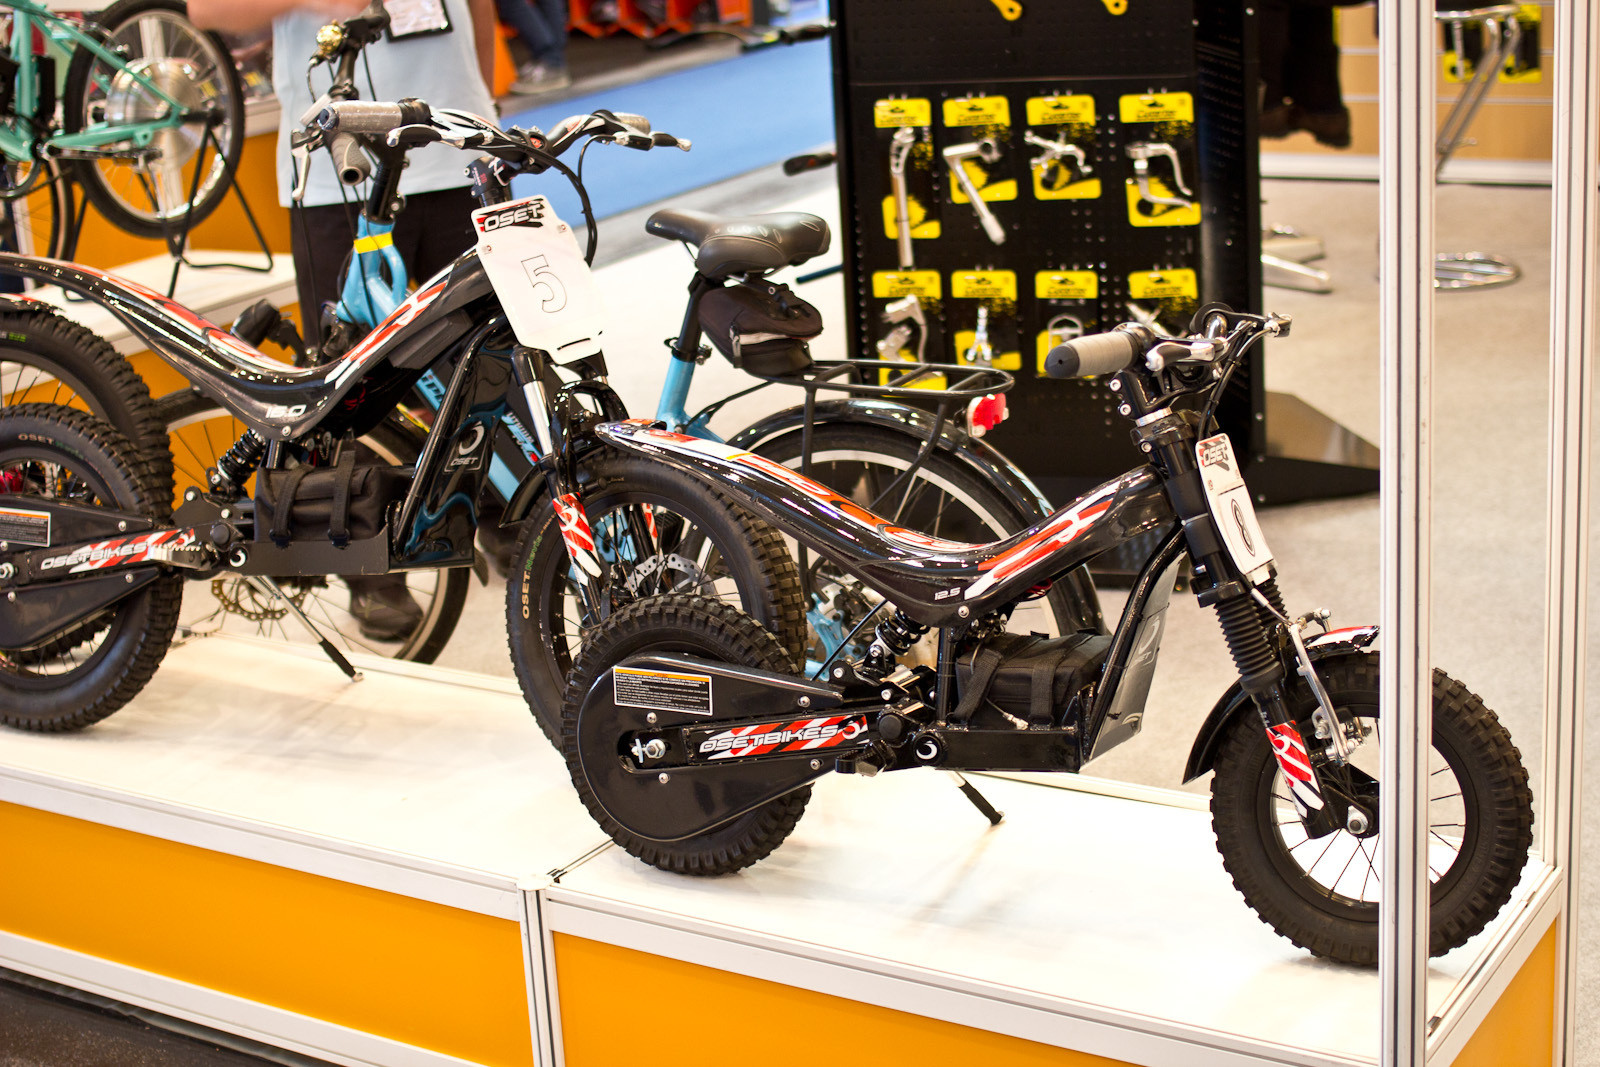 OSET Miniature Trials Motos - 2014 Kids Bikes at Eurobike 2013 - Mountain Biking Pictures - Vital MTB